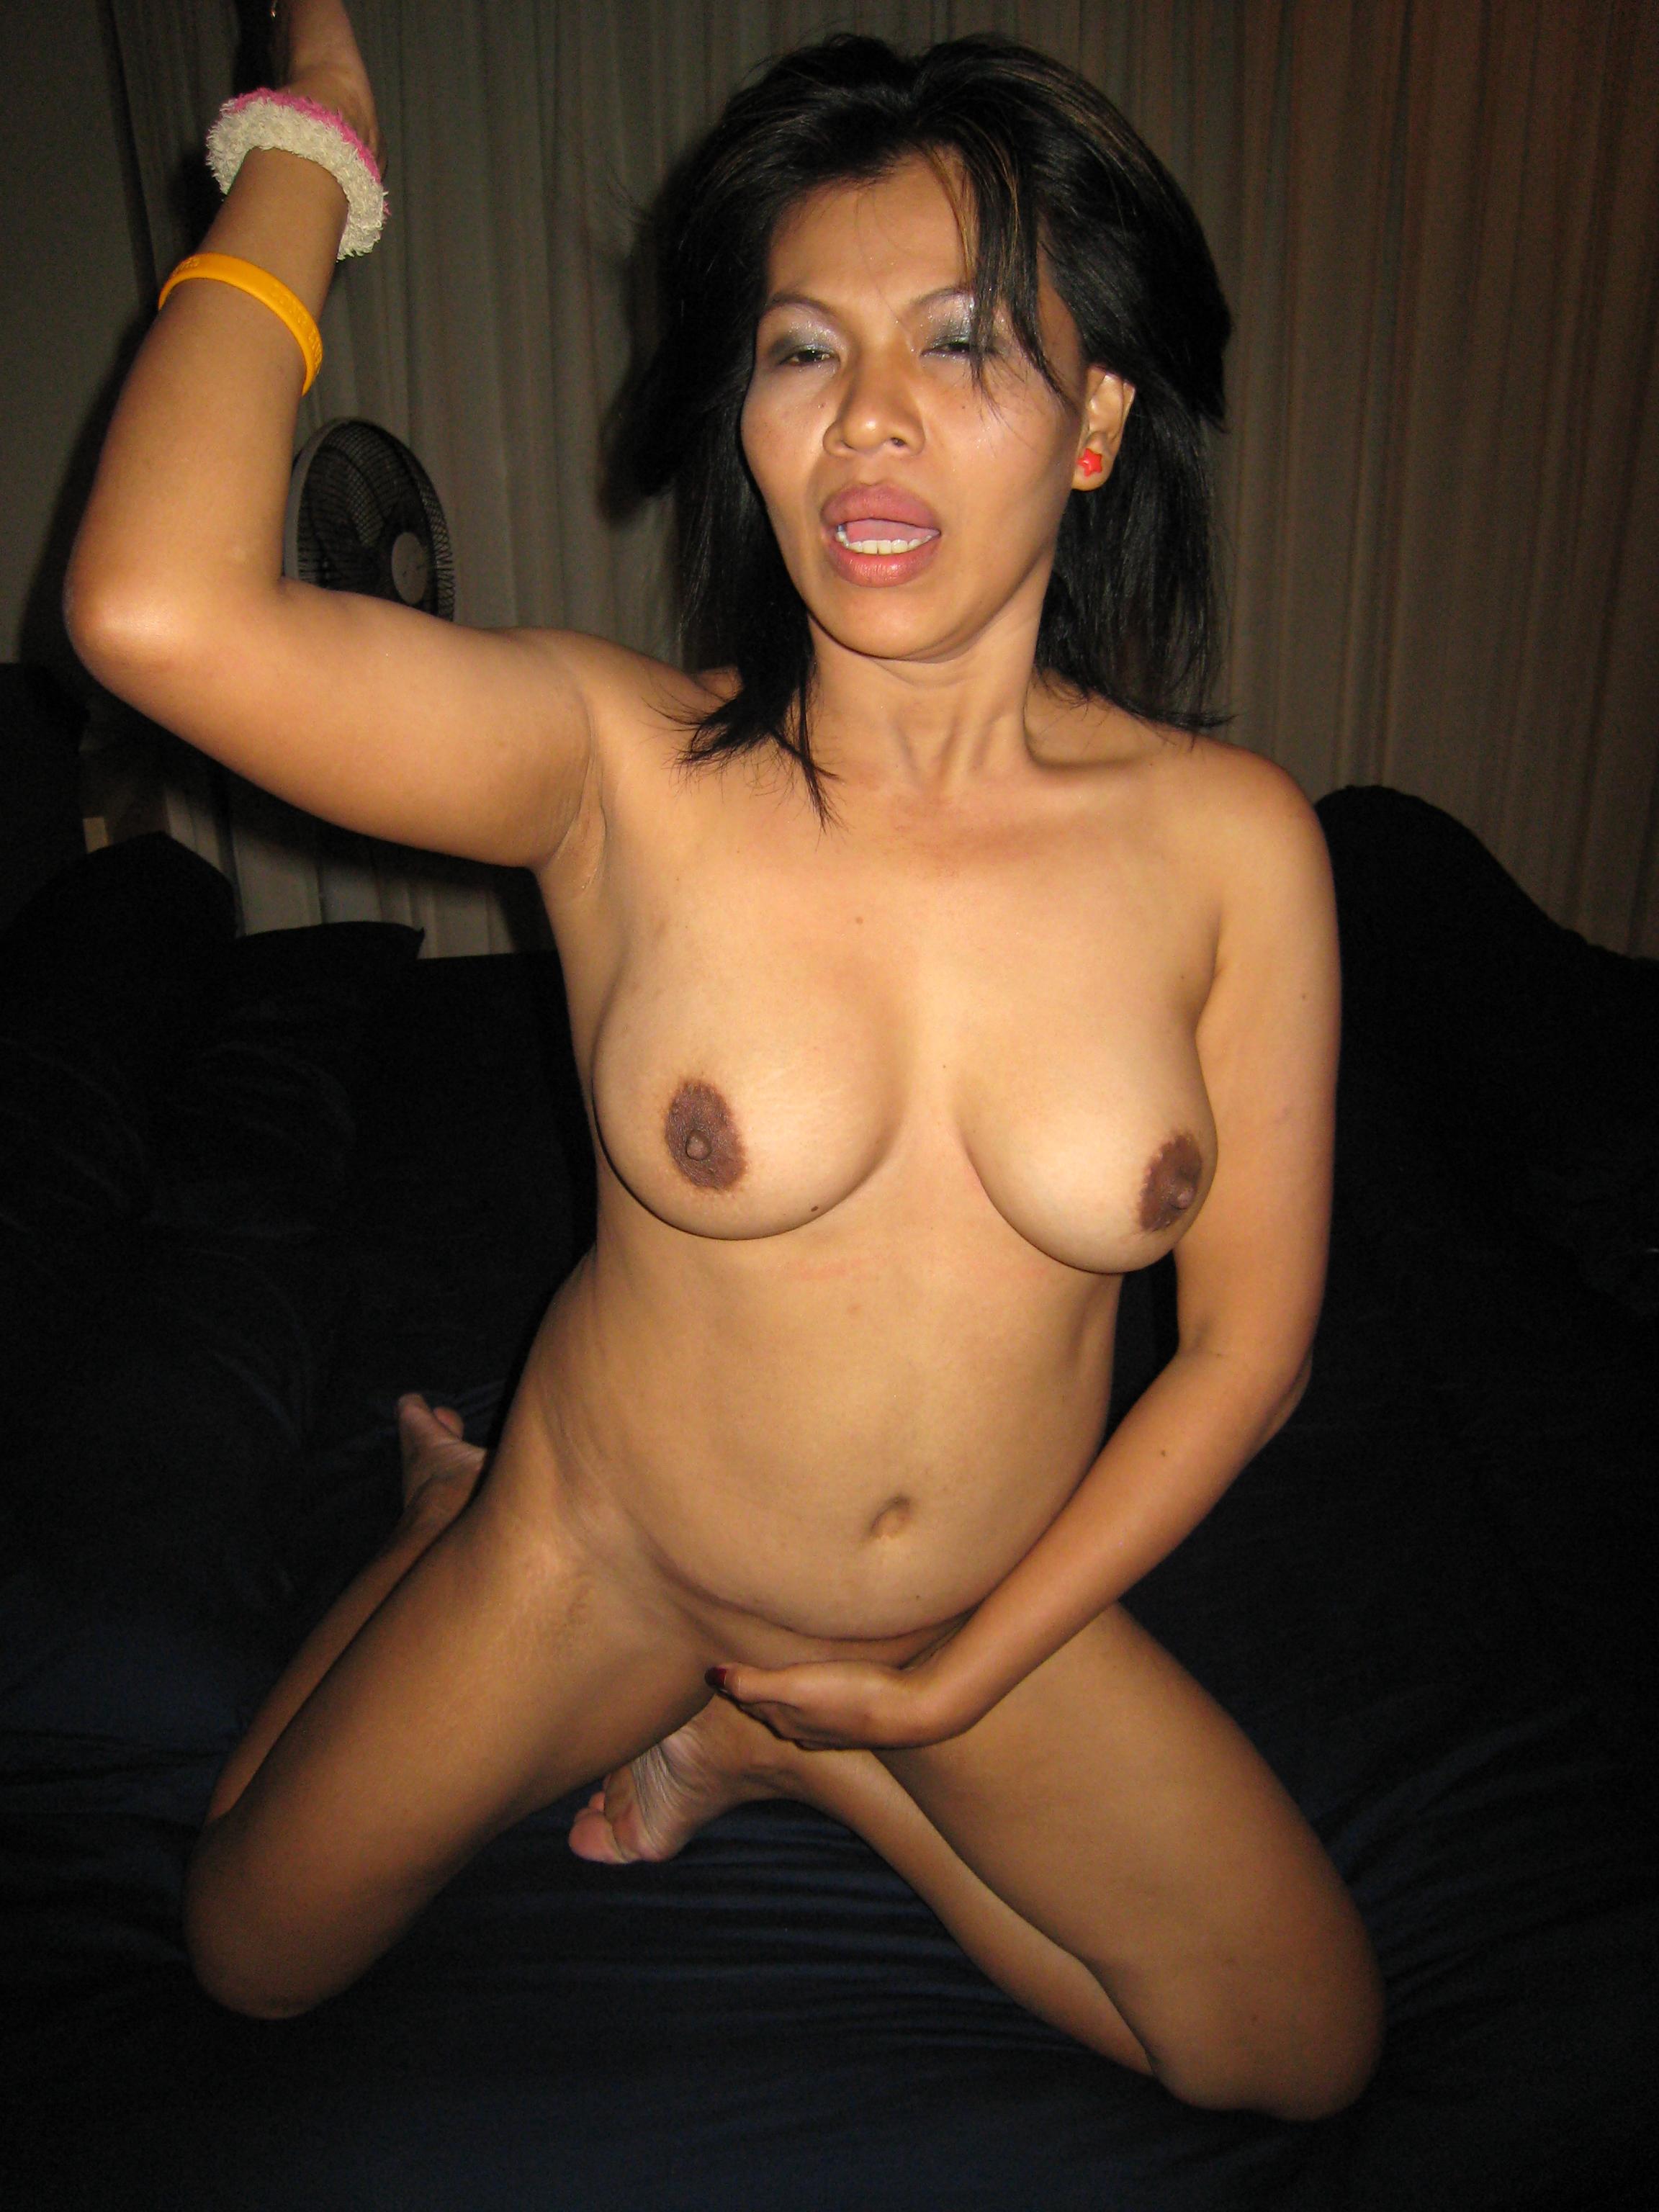 Teen sex position pics